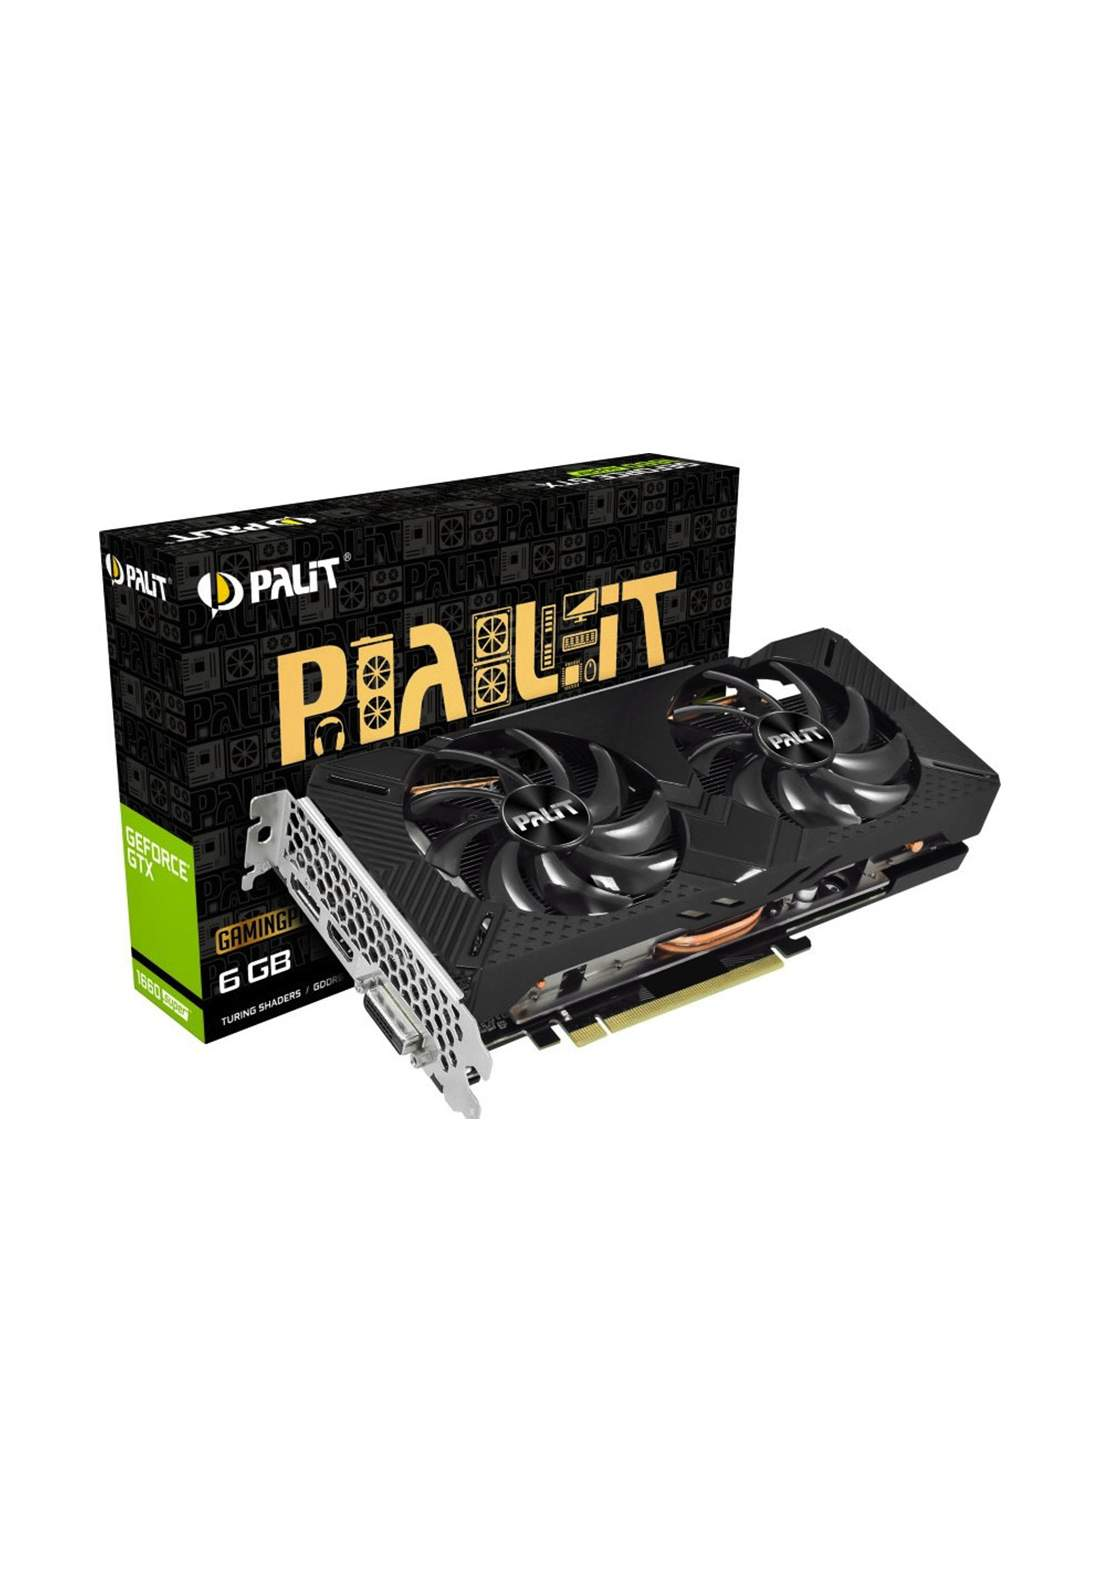 Palit GeForce GTX 1660 SUPER GP OC 8G Graphics Card